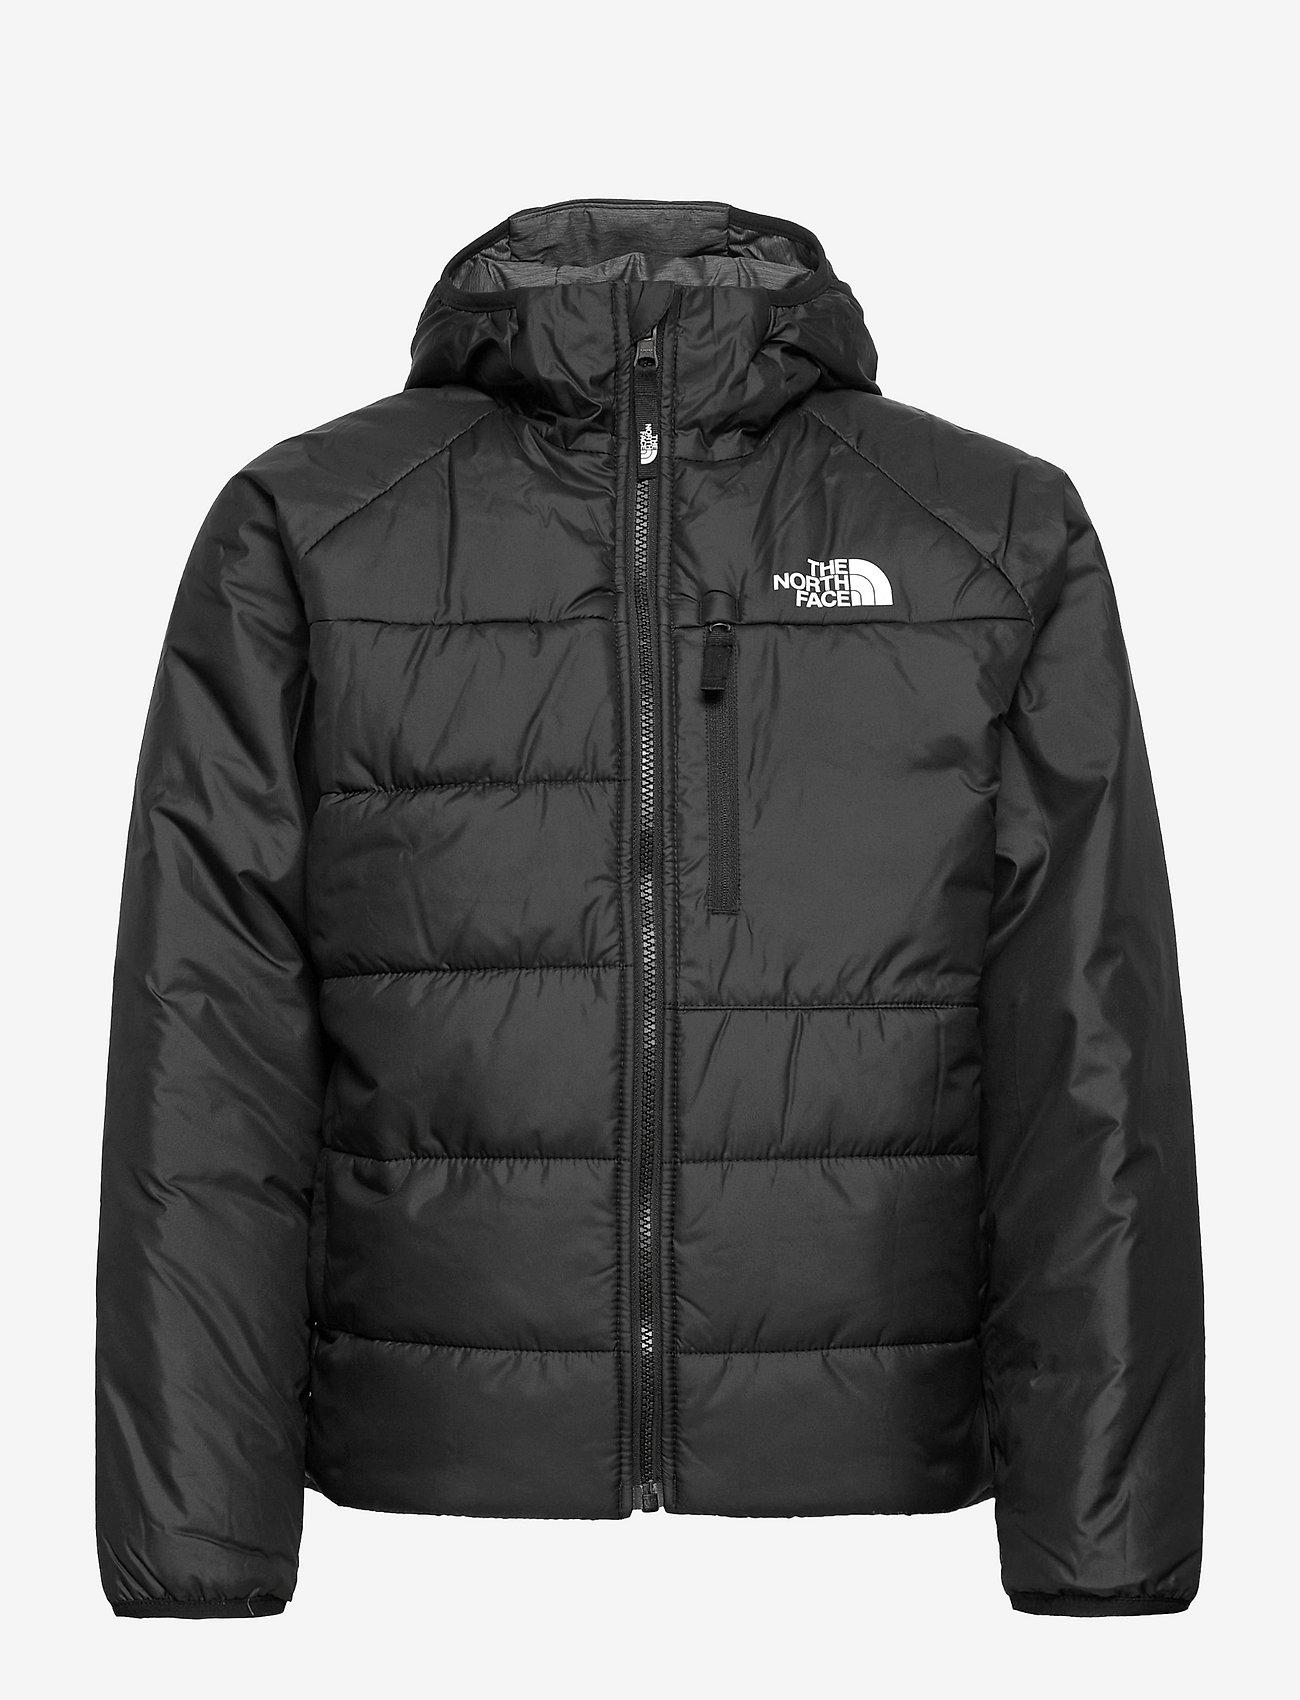 The North Face - B RVRSBL PERRITO JKT - geïsoleerde jassen - tnf black - 0